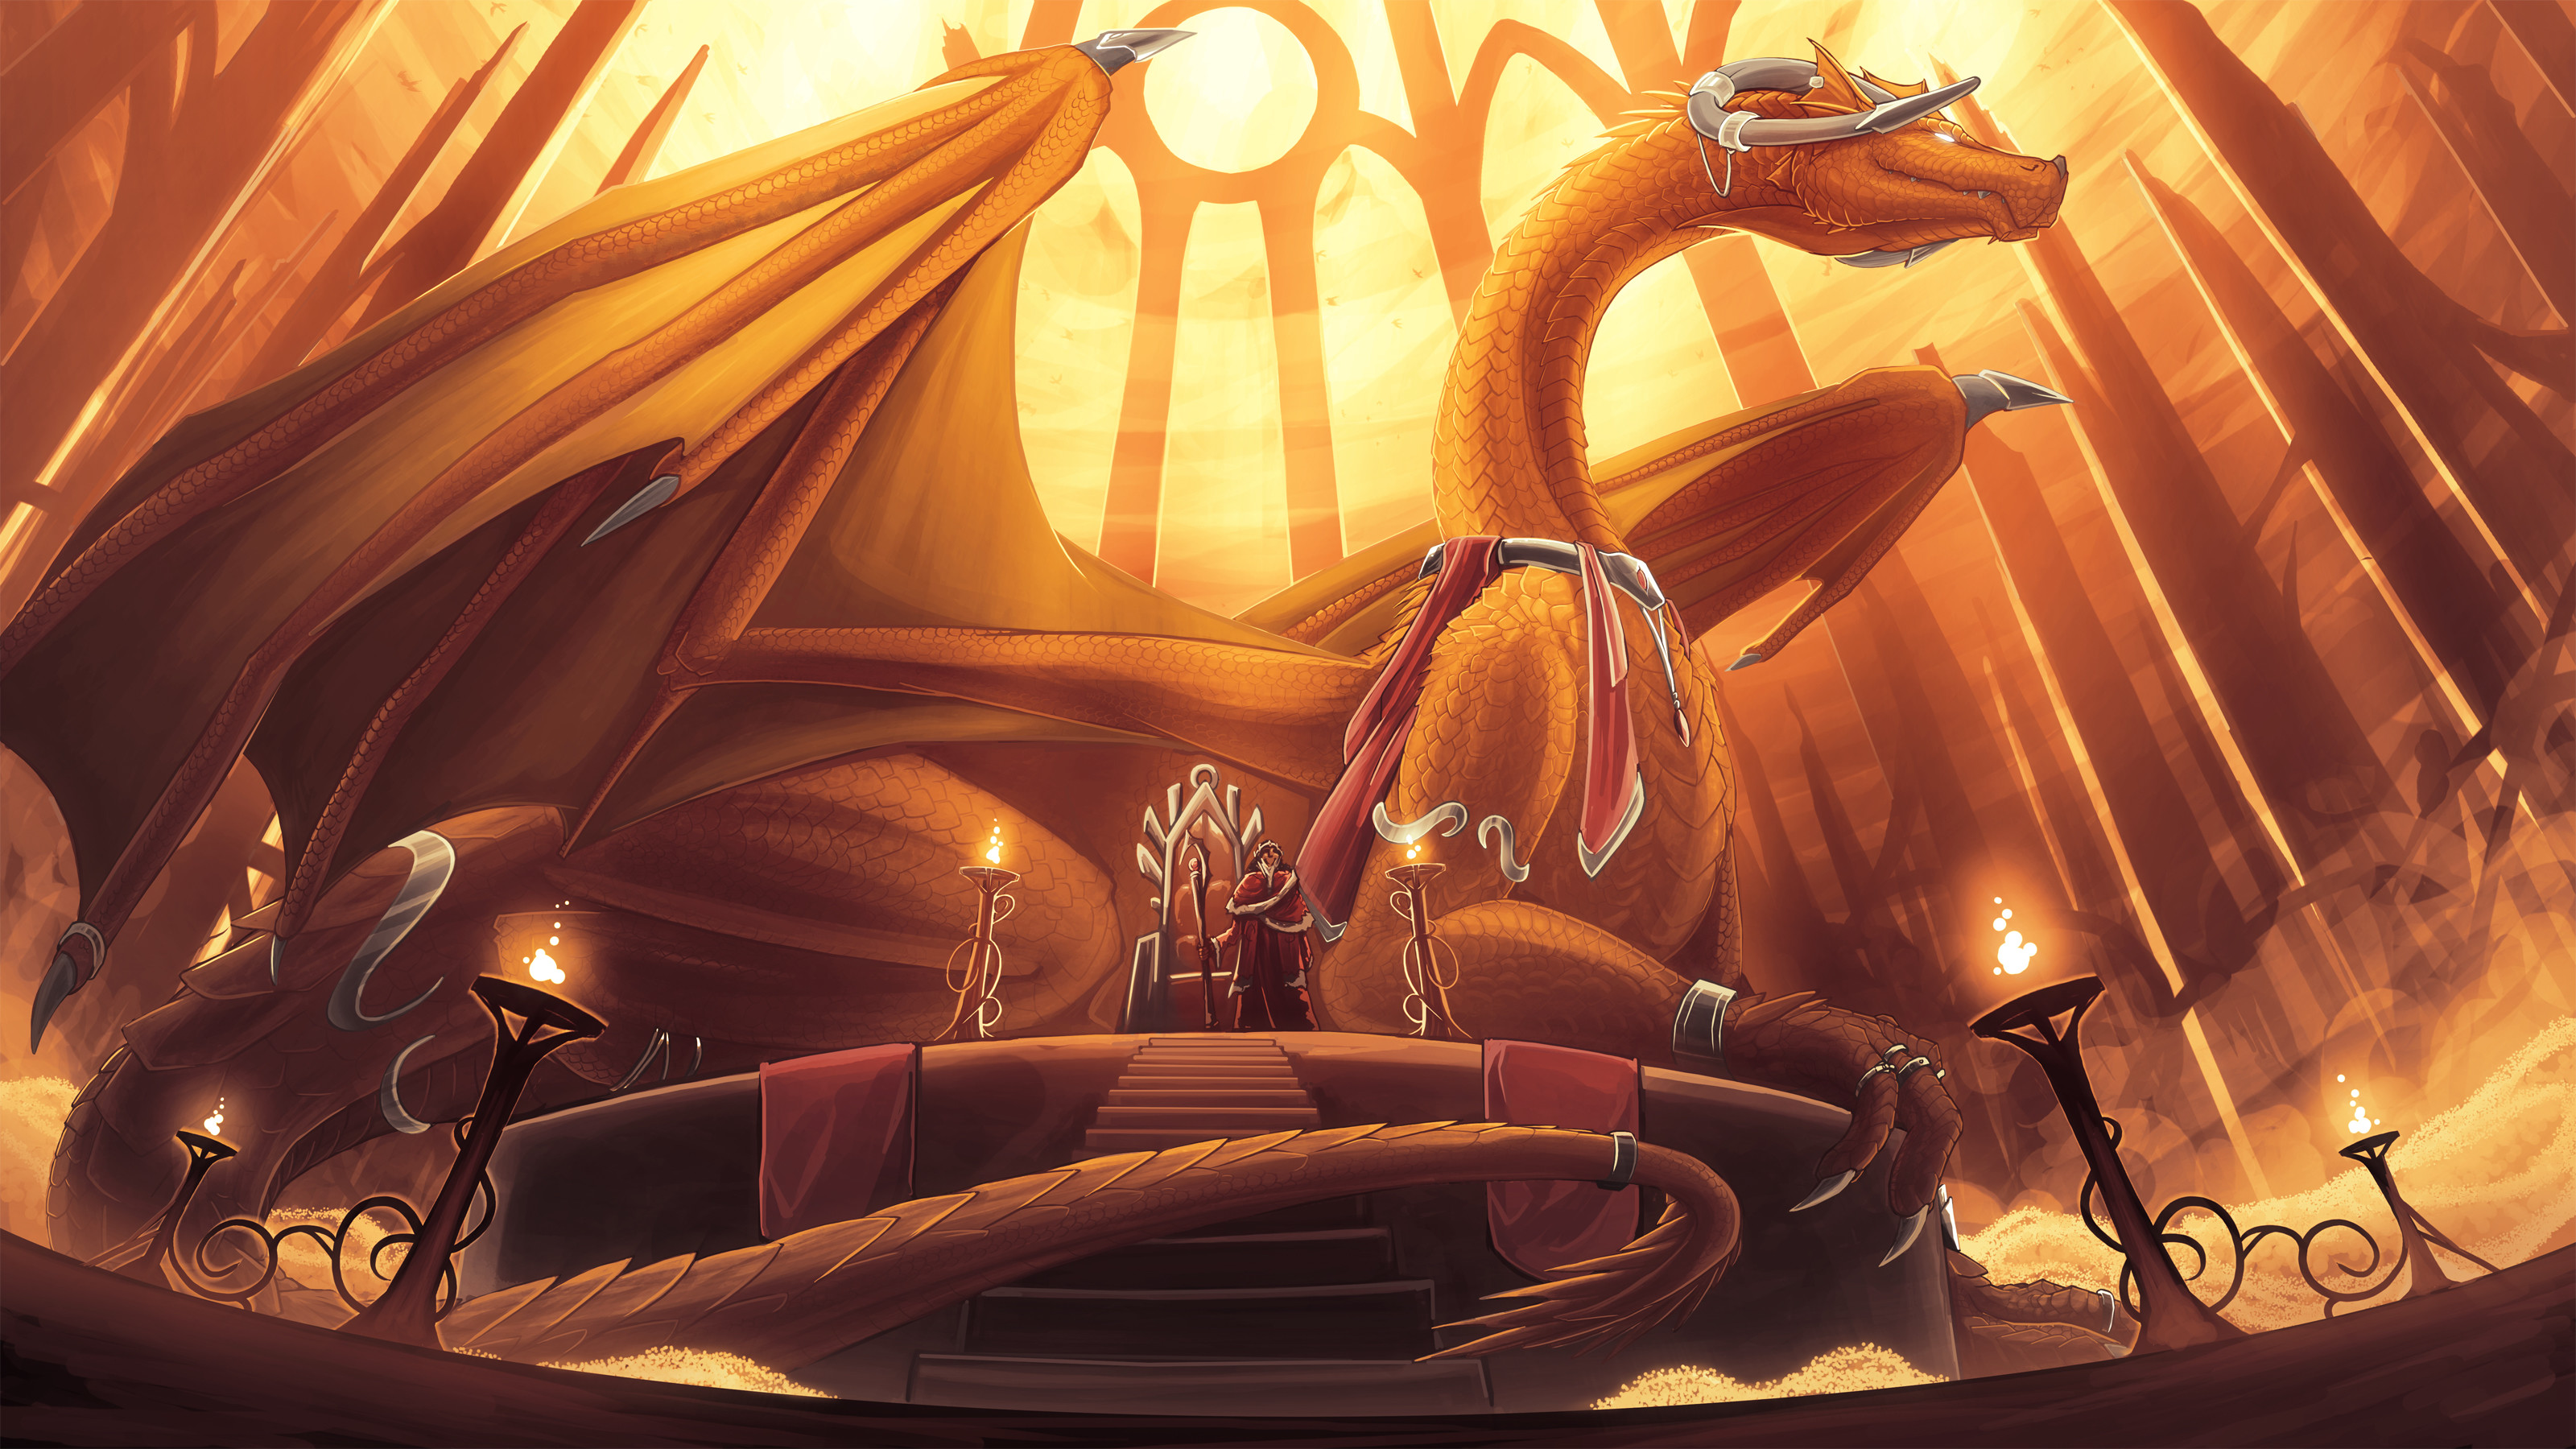 Fantasy – Dragon Throne Wallpaper